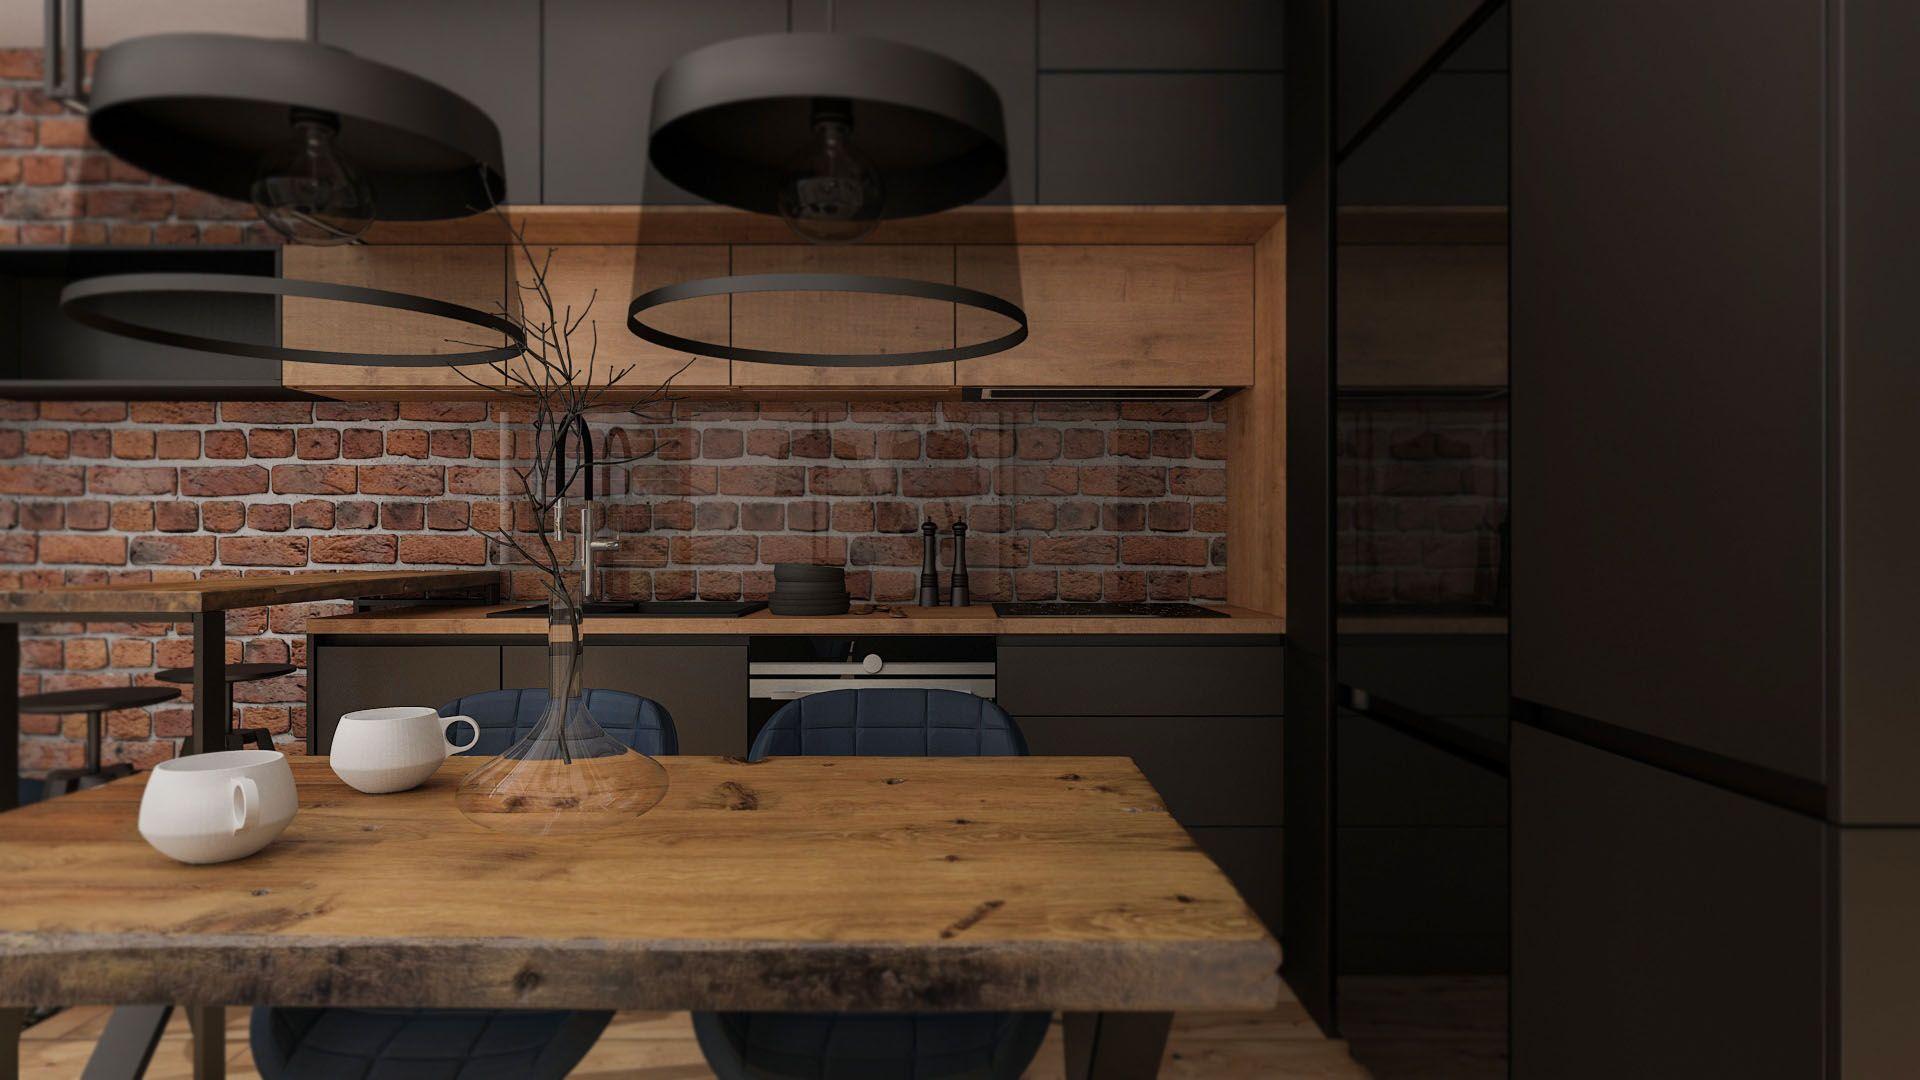 Nowoczesna Kuchnia Z Ciemnymi Meblami Kitchen Design House Interior Home Decor